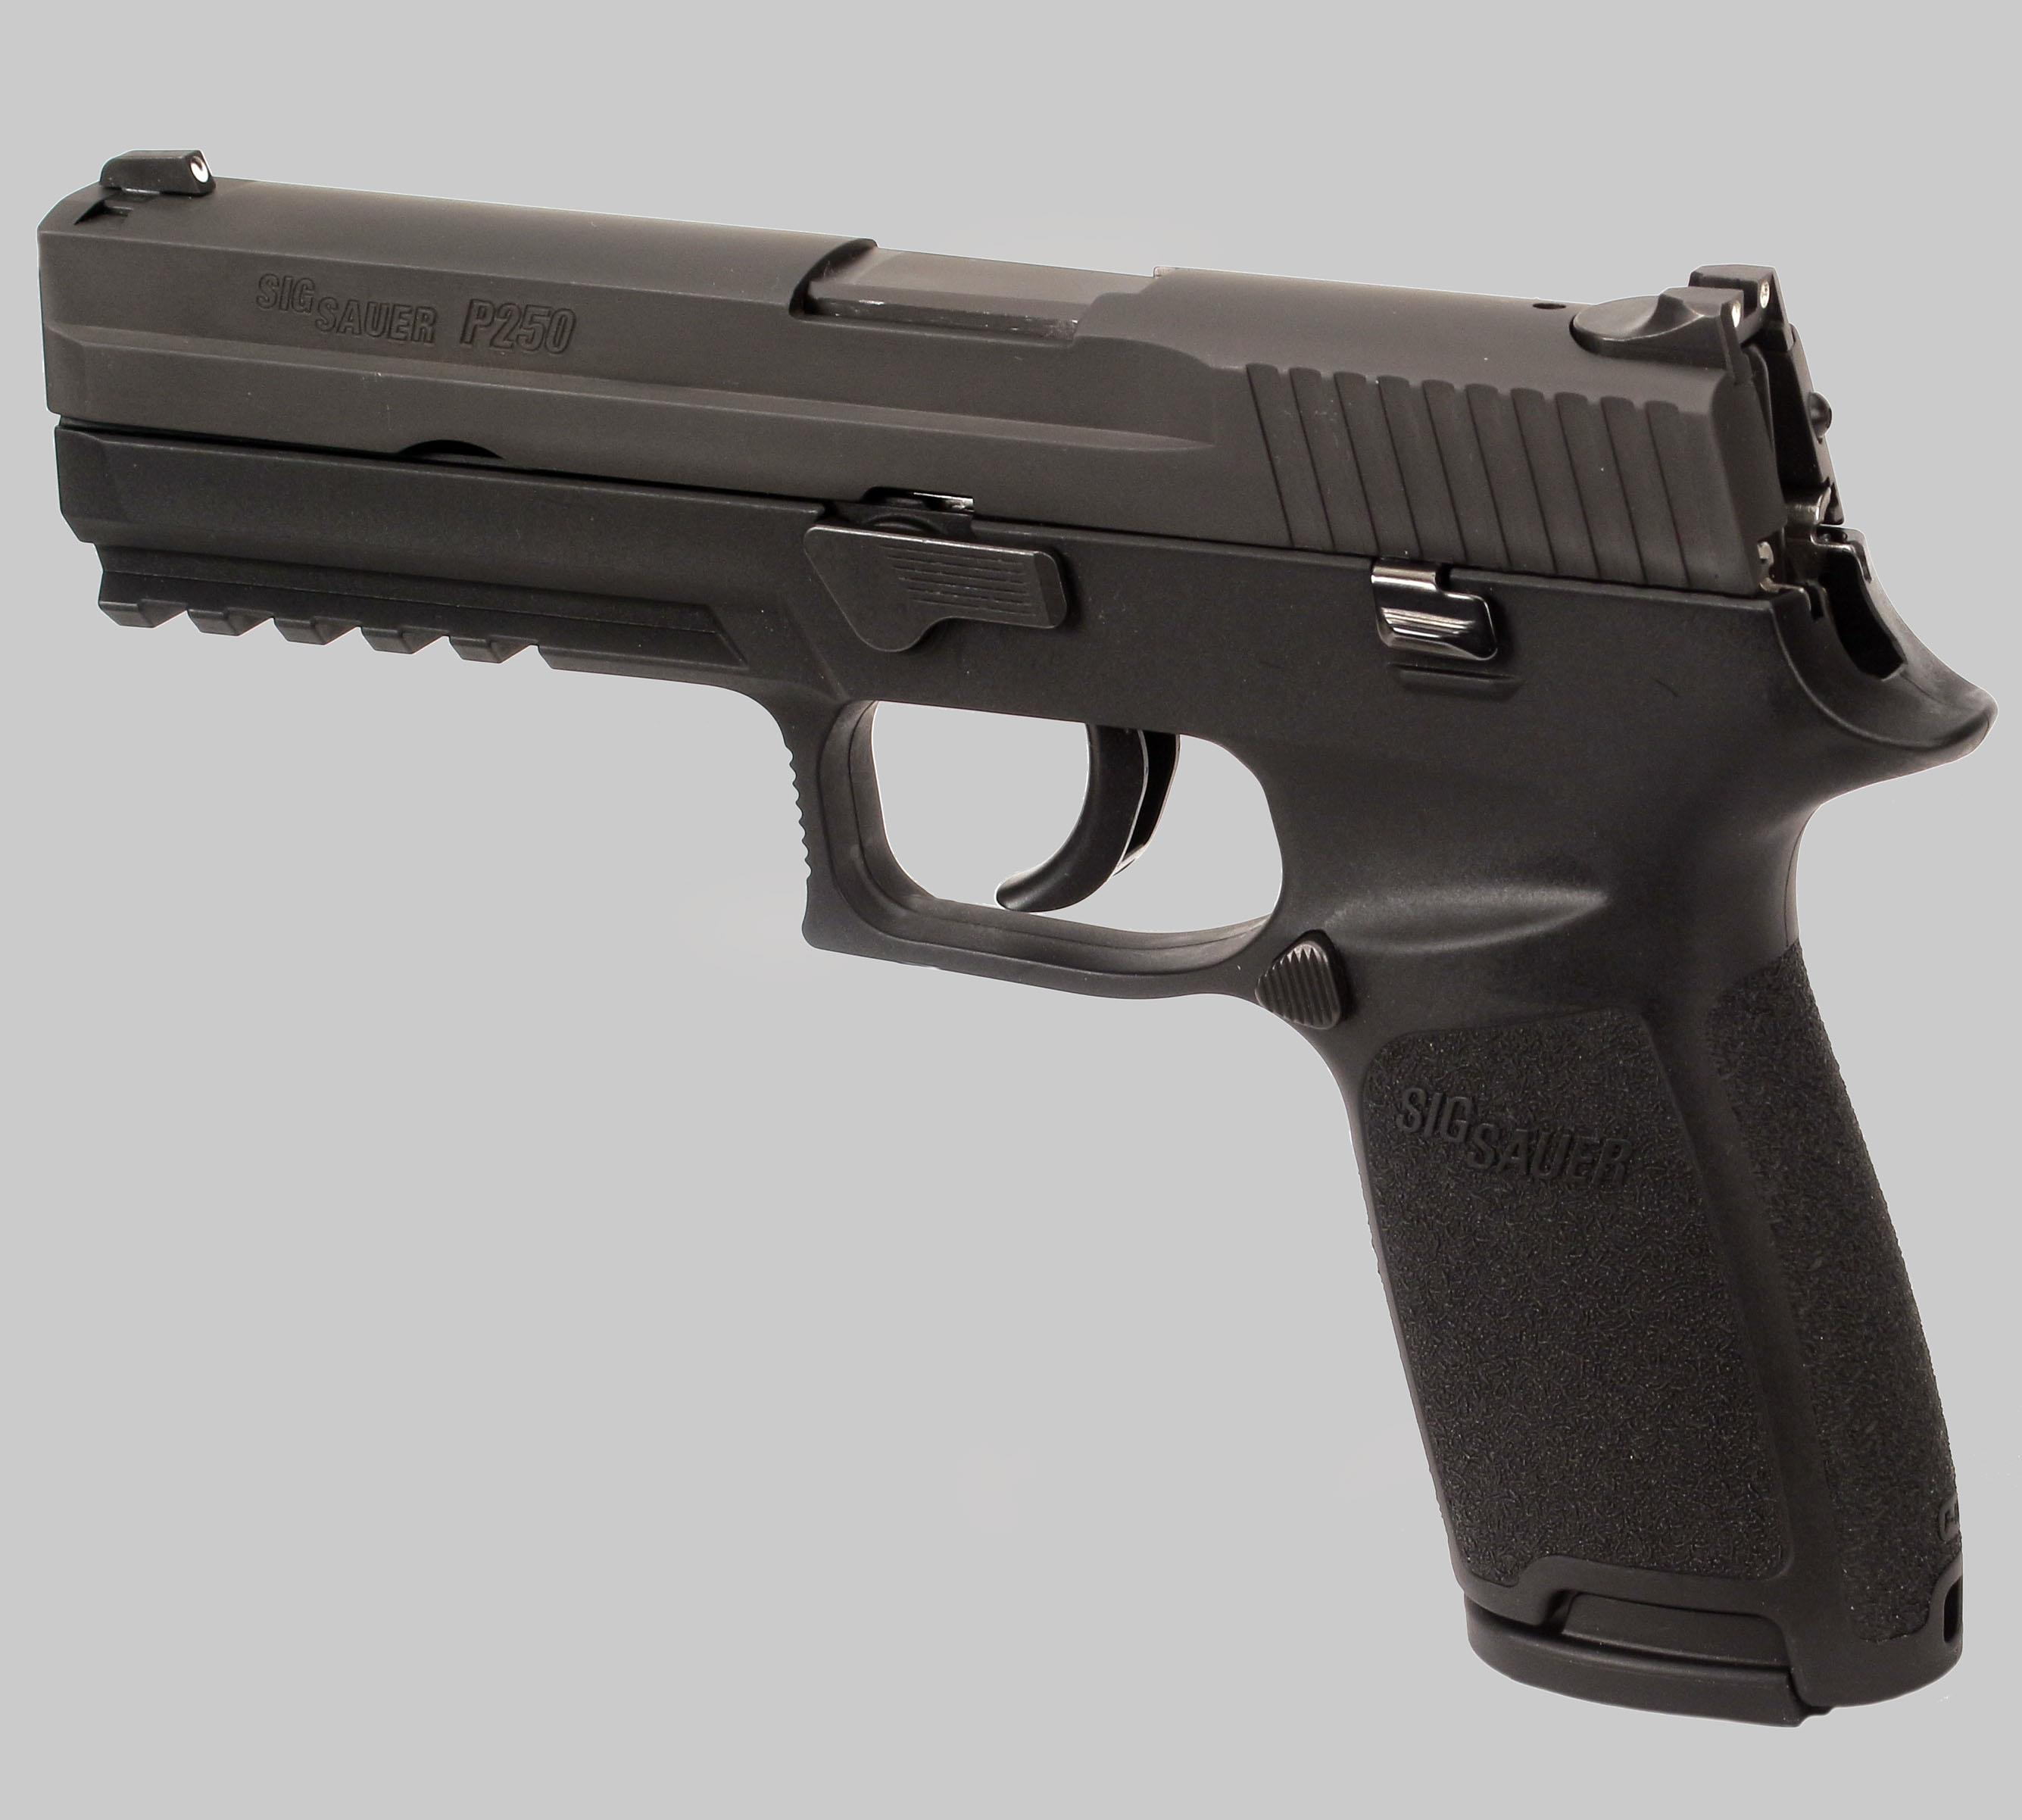 Sig Sauer P250 Pistol for sale